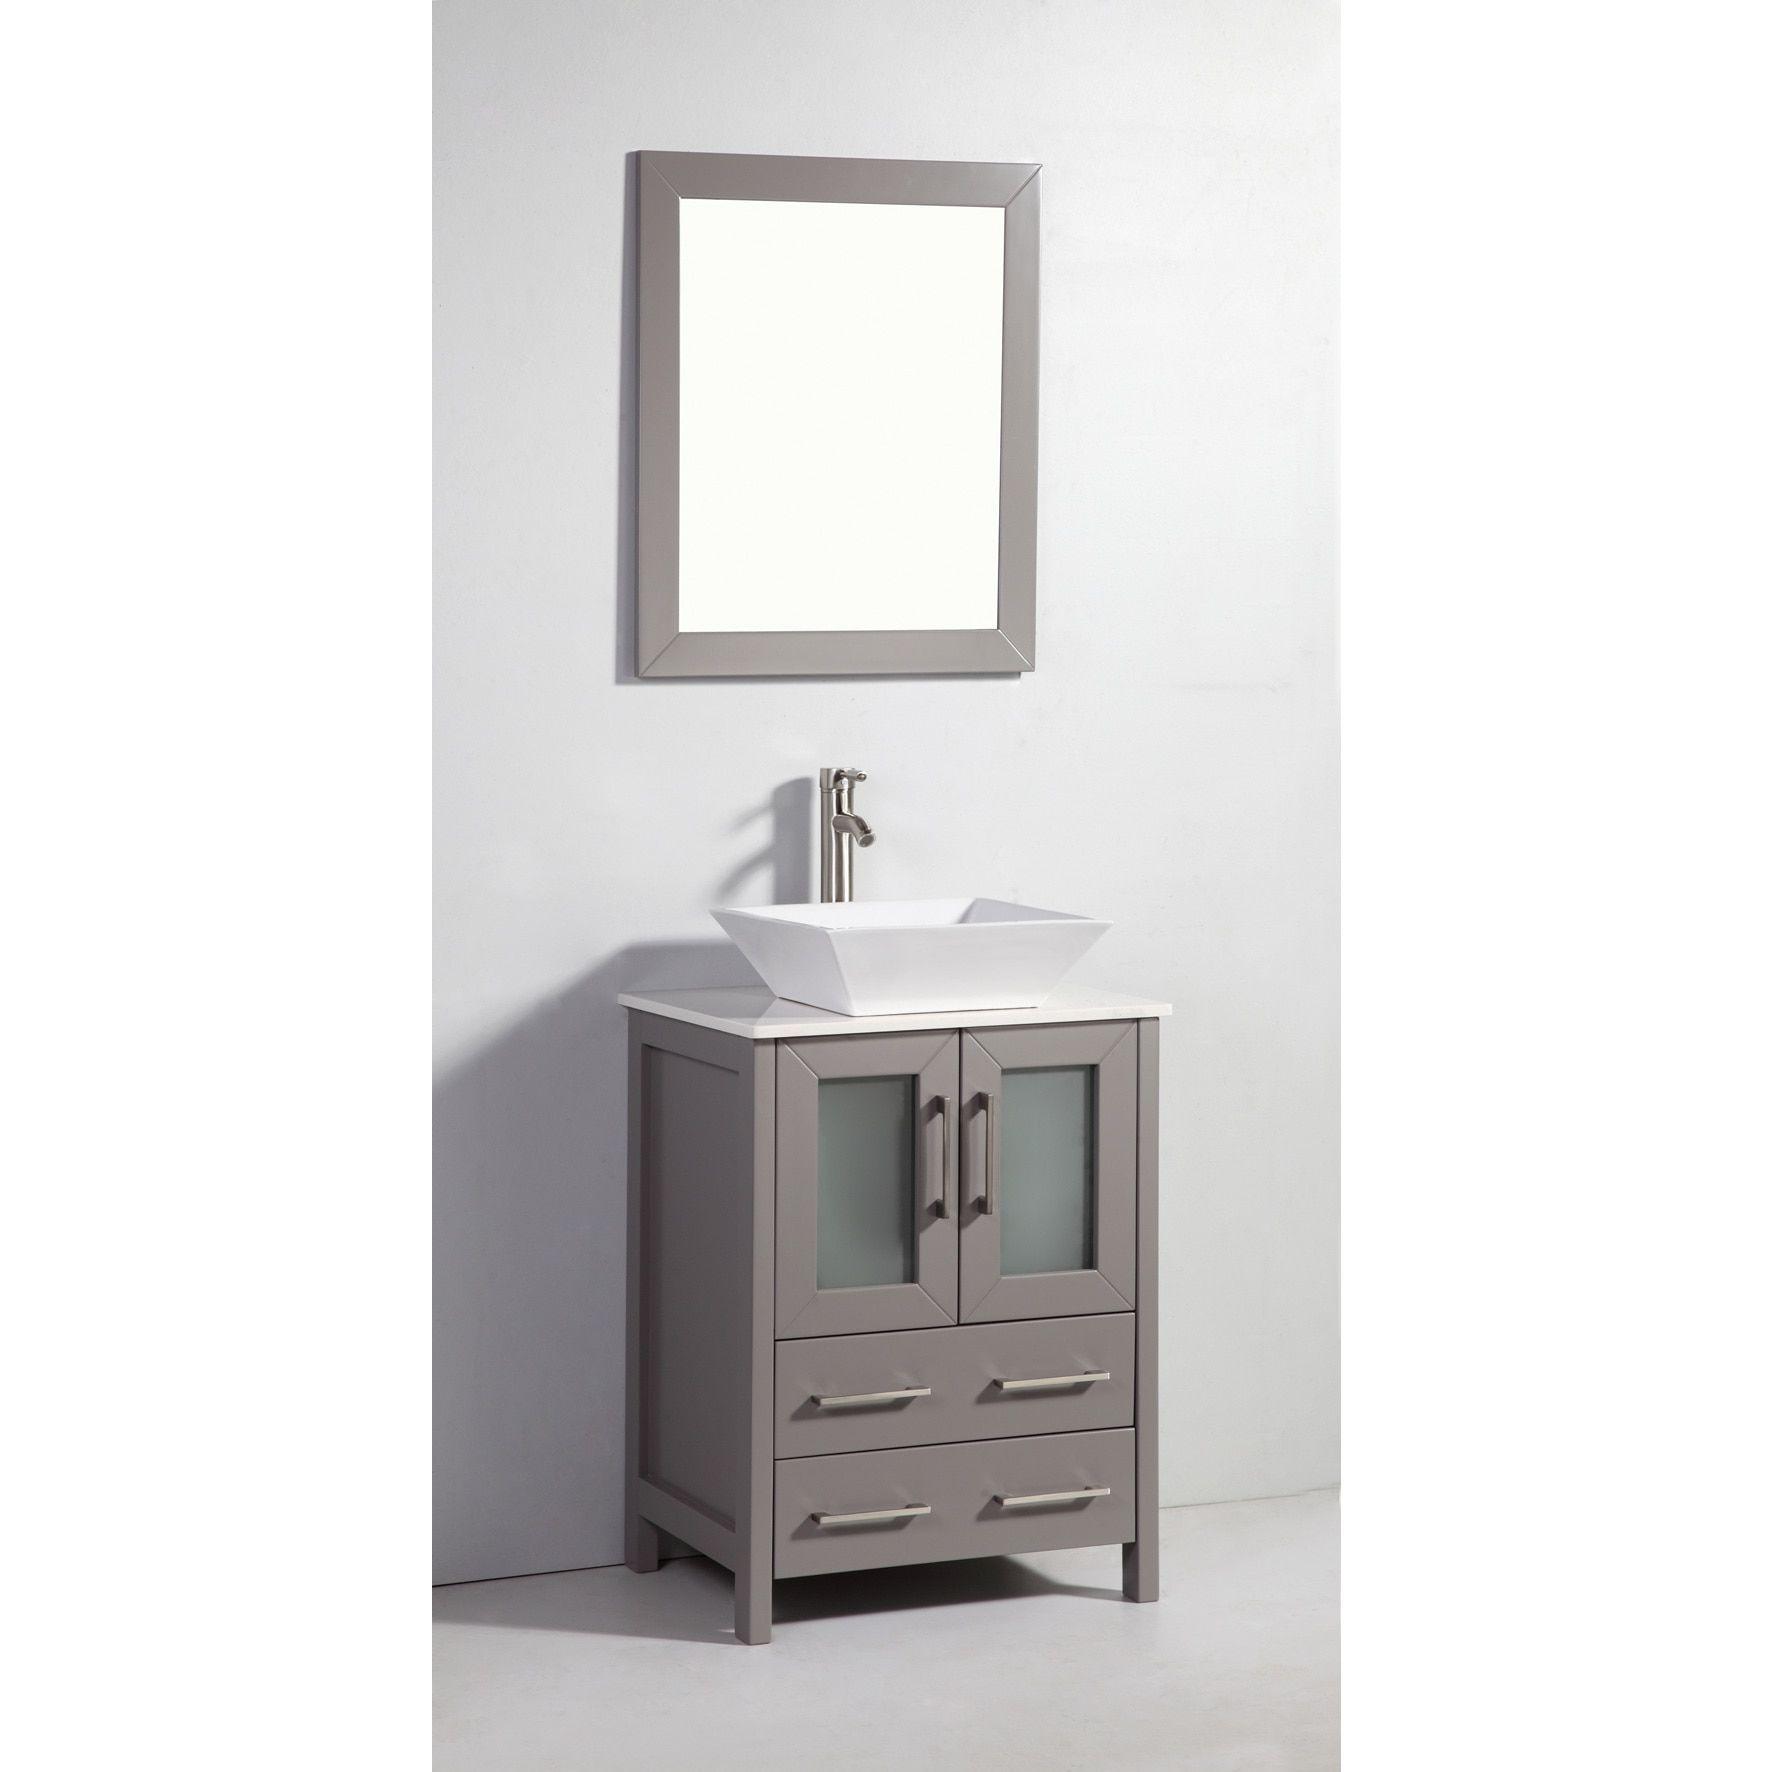 vanity art 24 inch single sink bathroom vanity set with ceramic top rh pinterest com